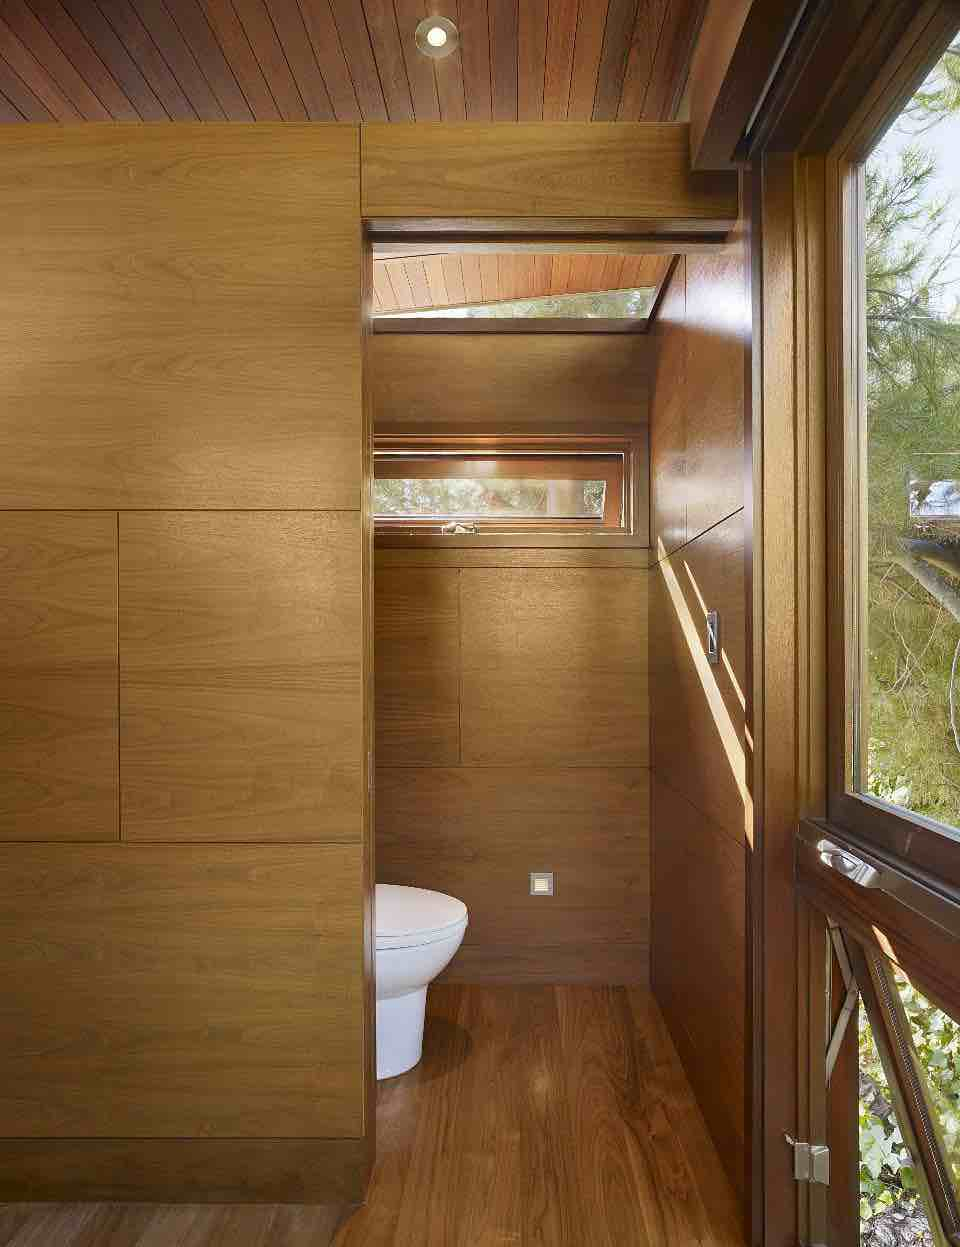 The-Banyan-Treehouse-10